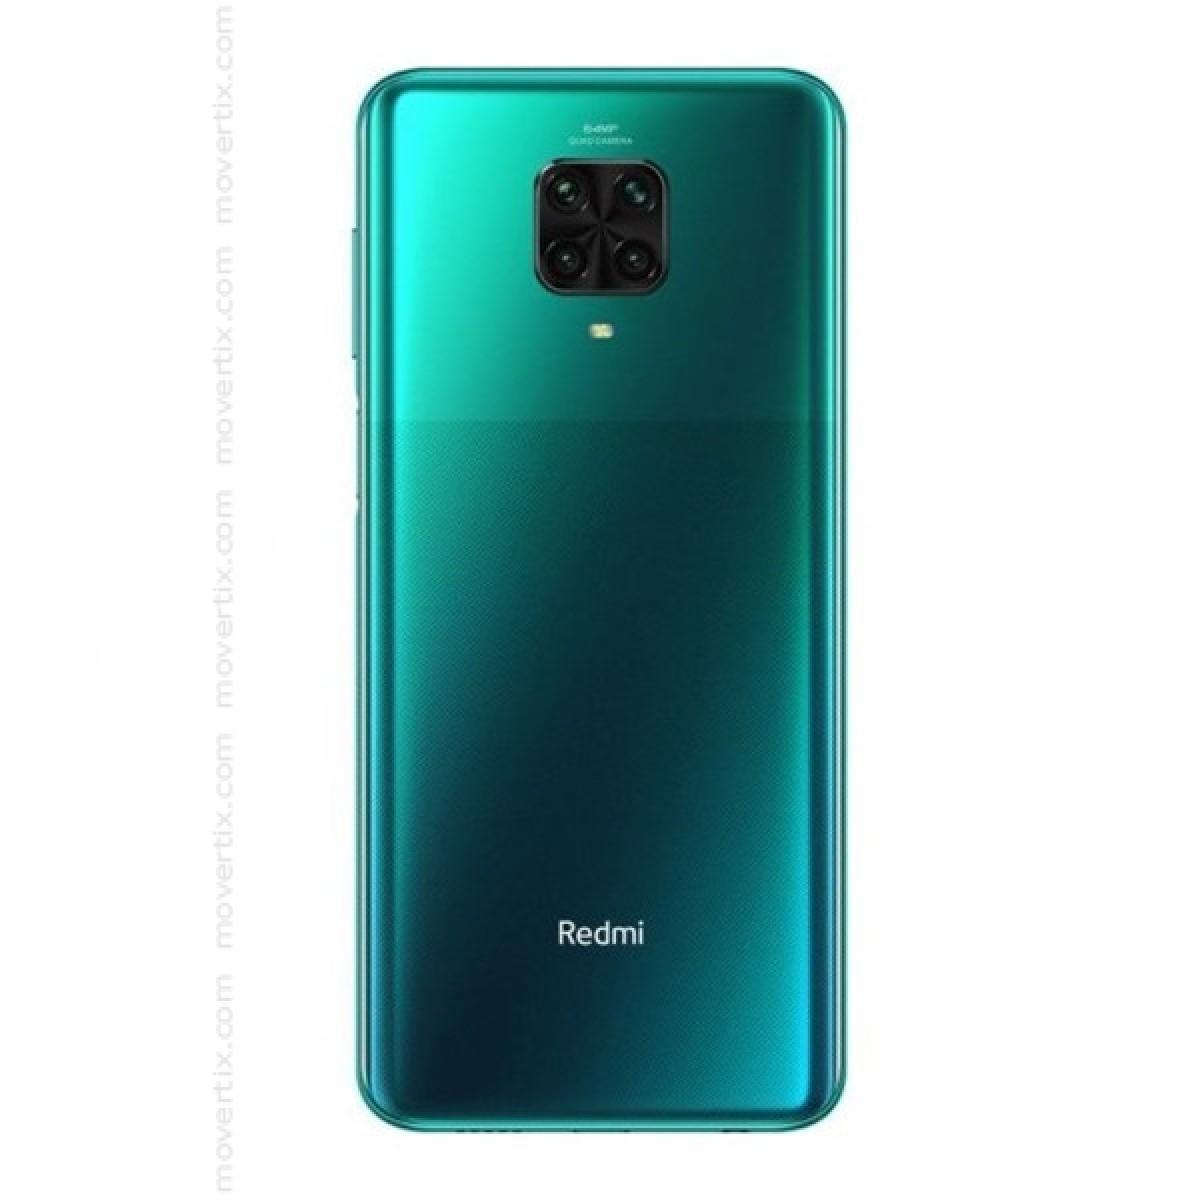 Xiaomi Redmi Note 9 Pro Dual Sim Tropical Green 64gb And 6gb Ram 6941059643463 Movertix Mobile Phones Shop